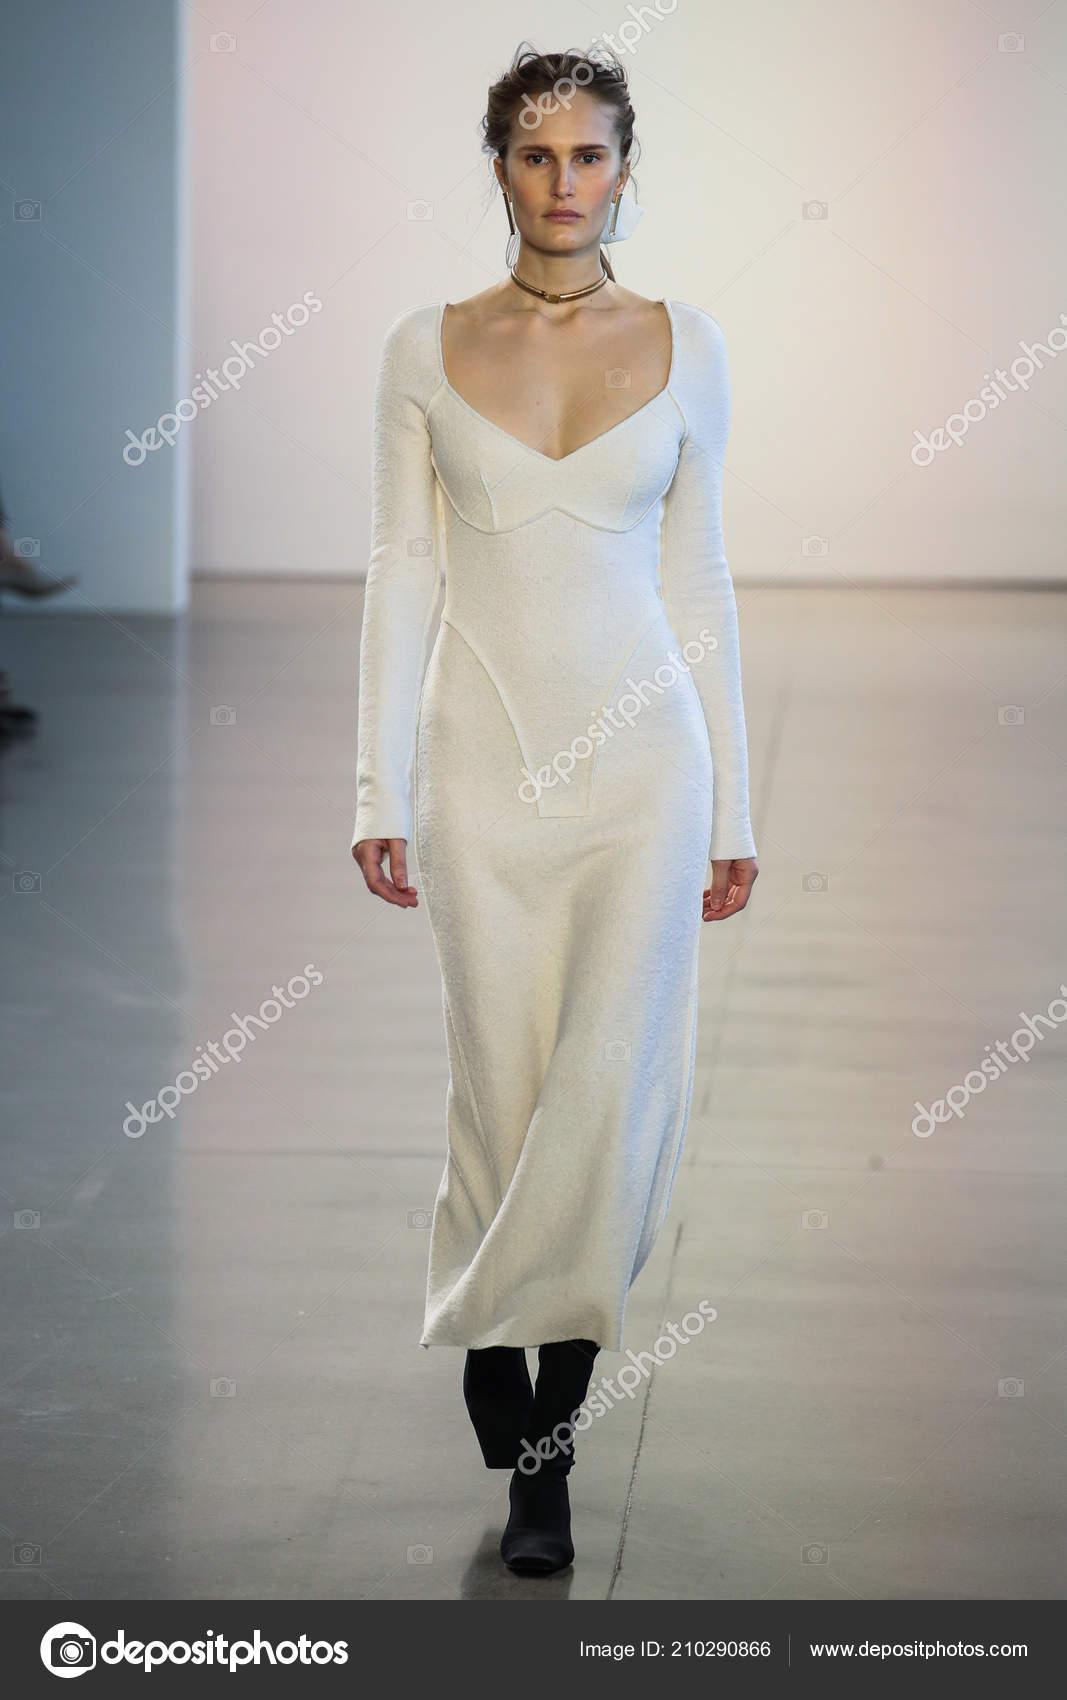 New York February Model Alla Kostromichova Walks Runway